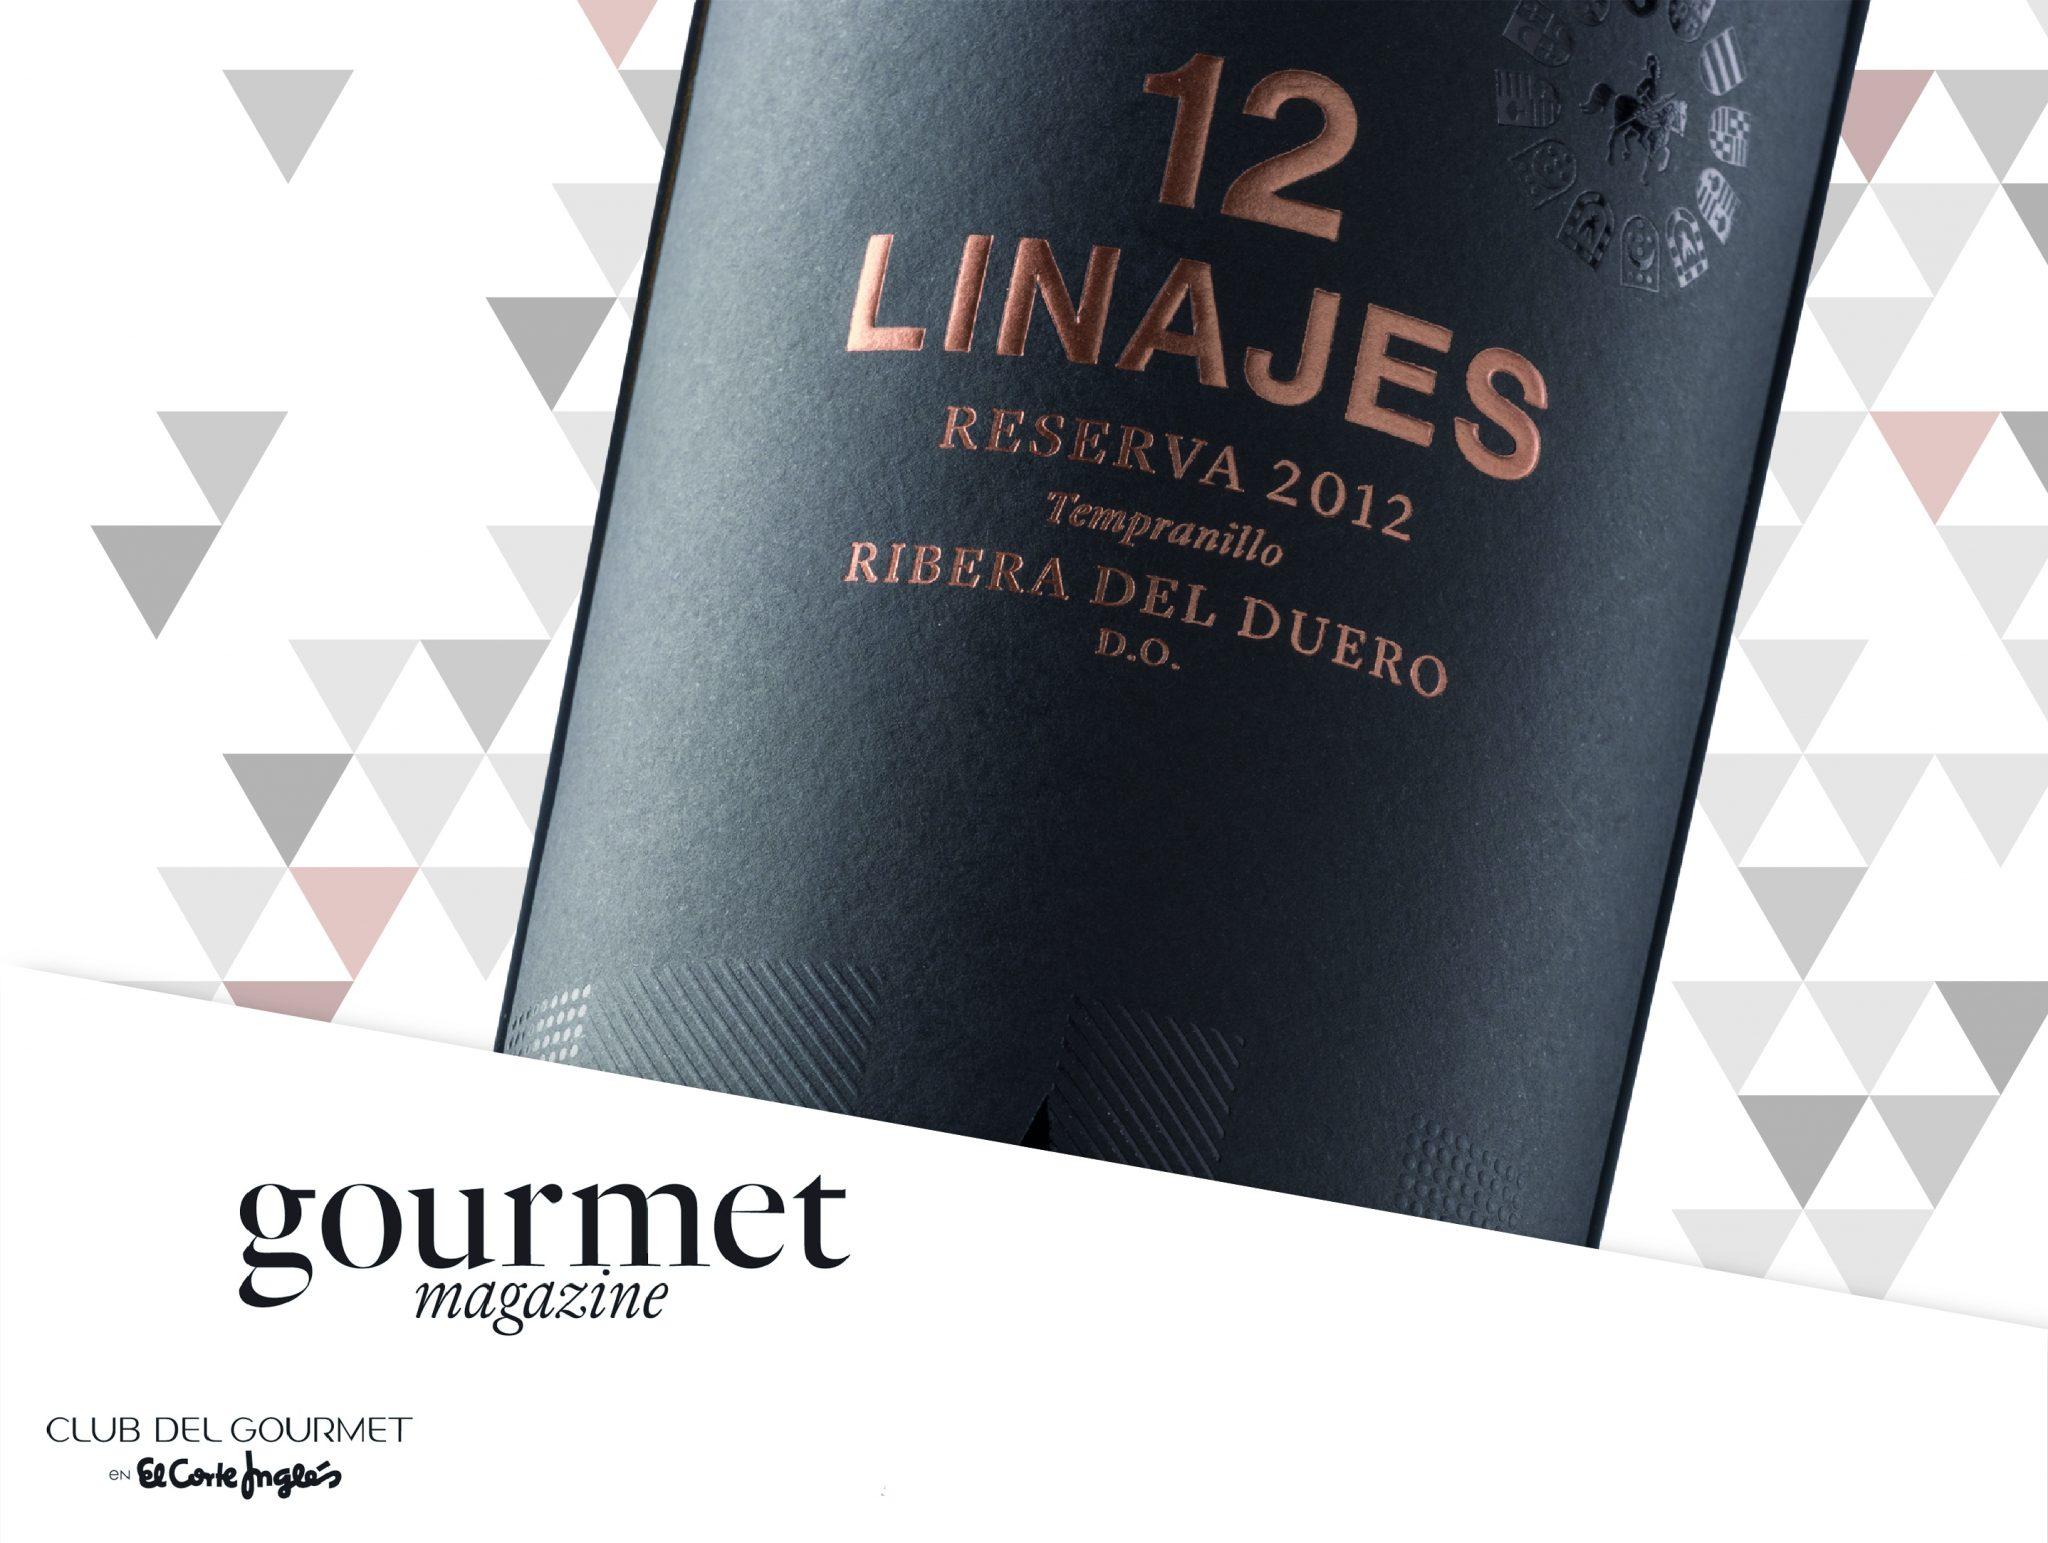 12 Linajes, daring wine pairings